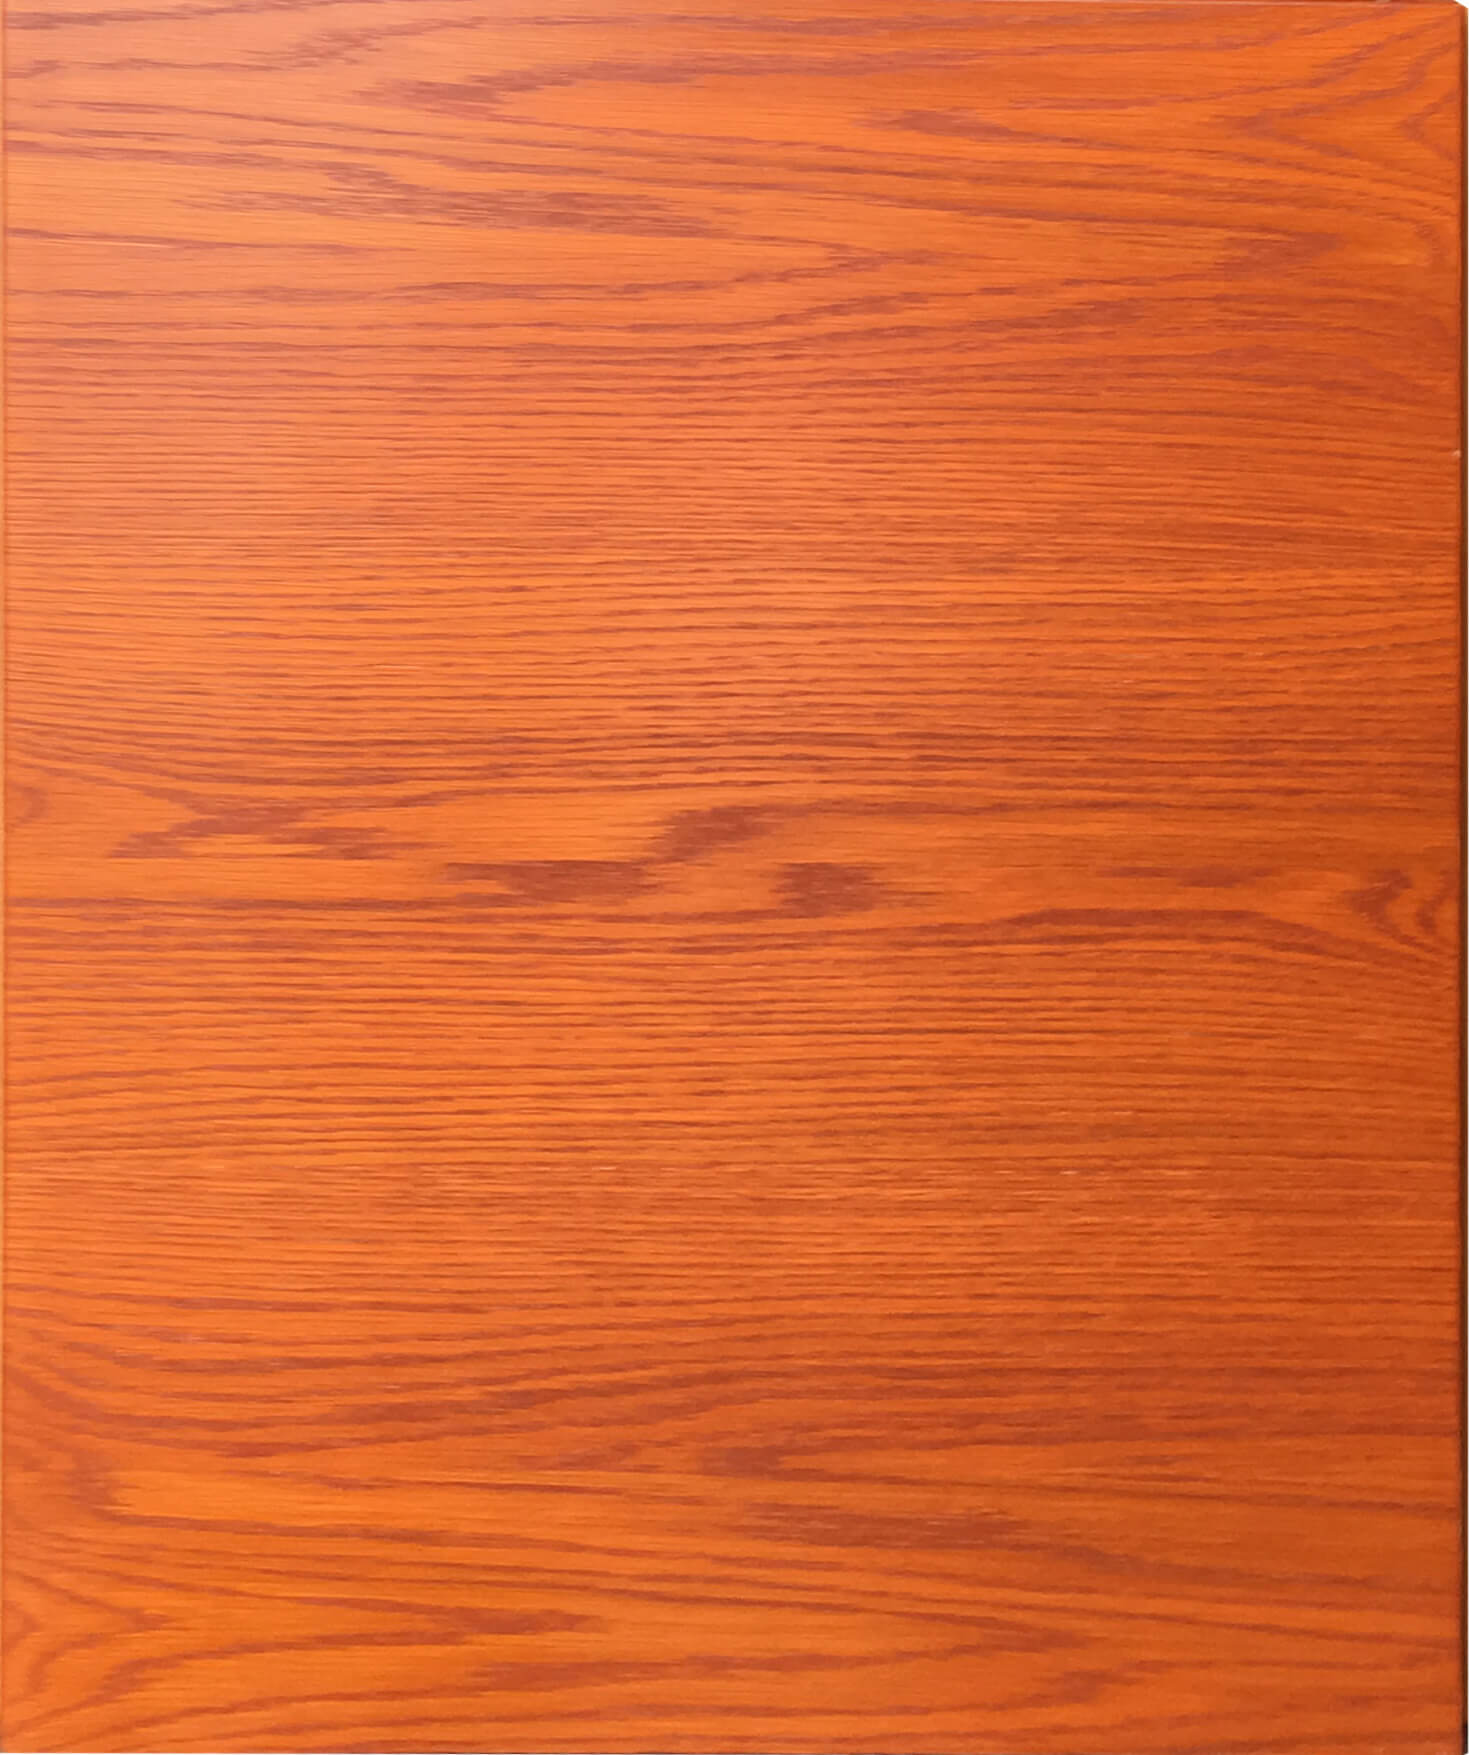 Ikea Effektiv Tisch Ansatzplatte 60x80cm Goldbraun 220143633